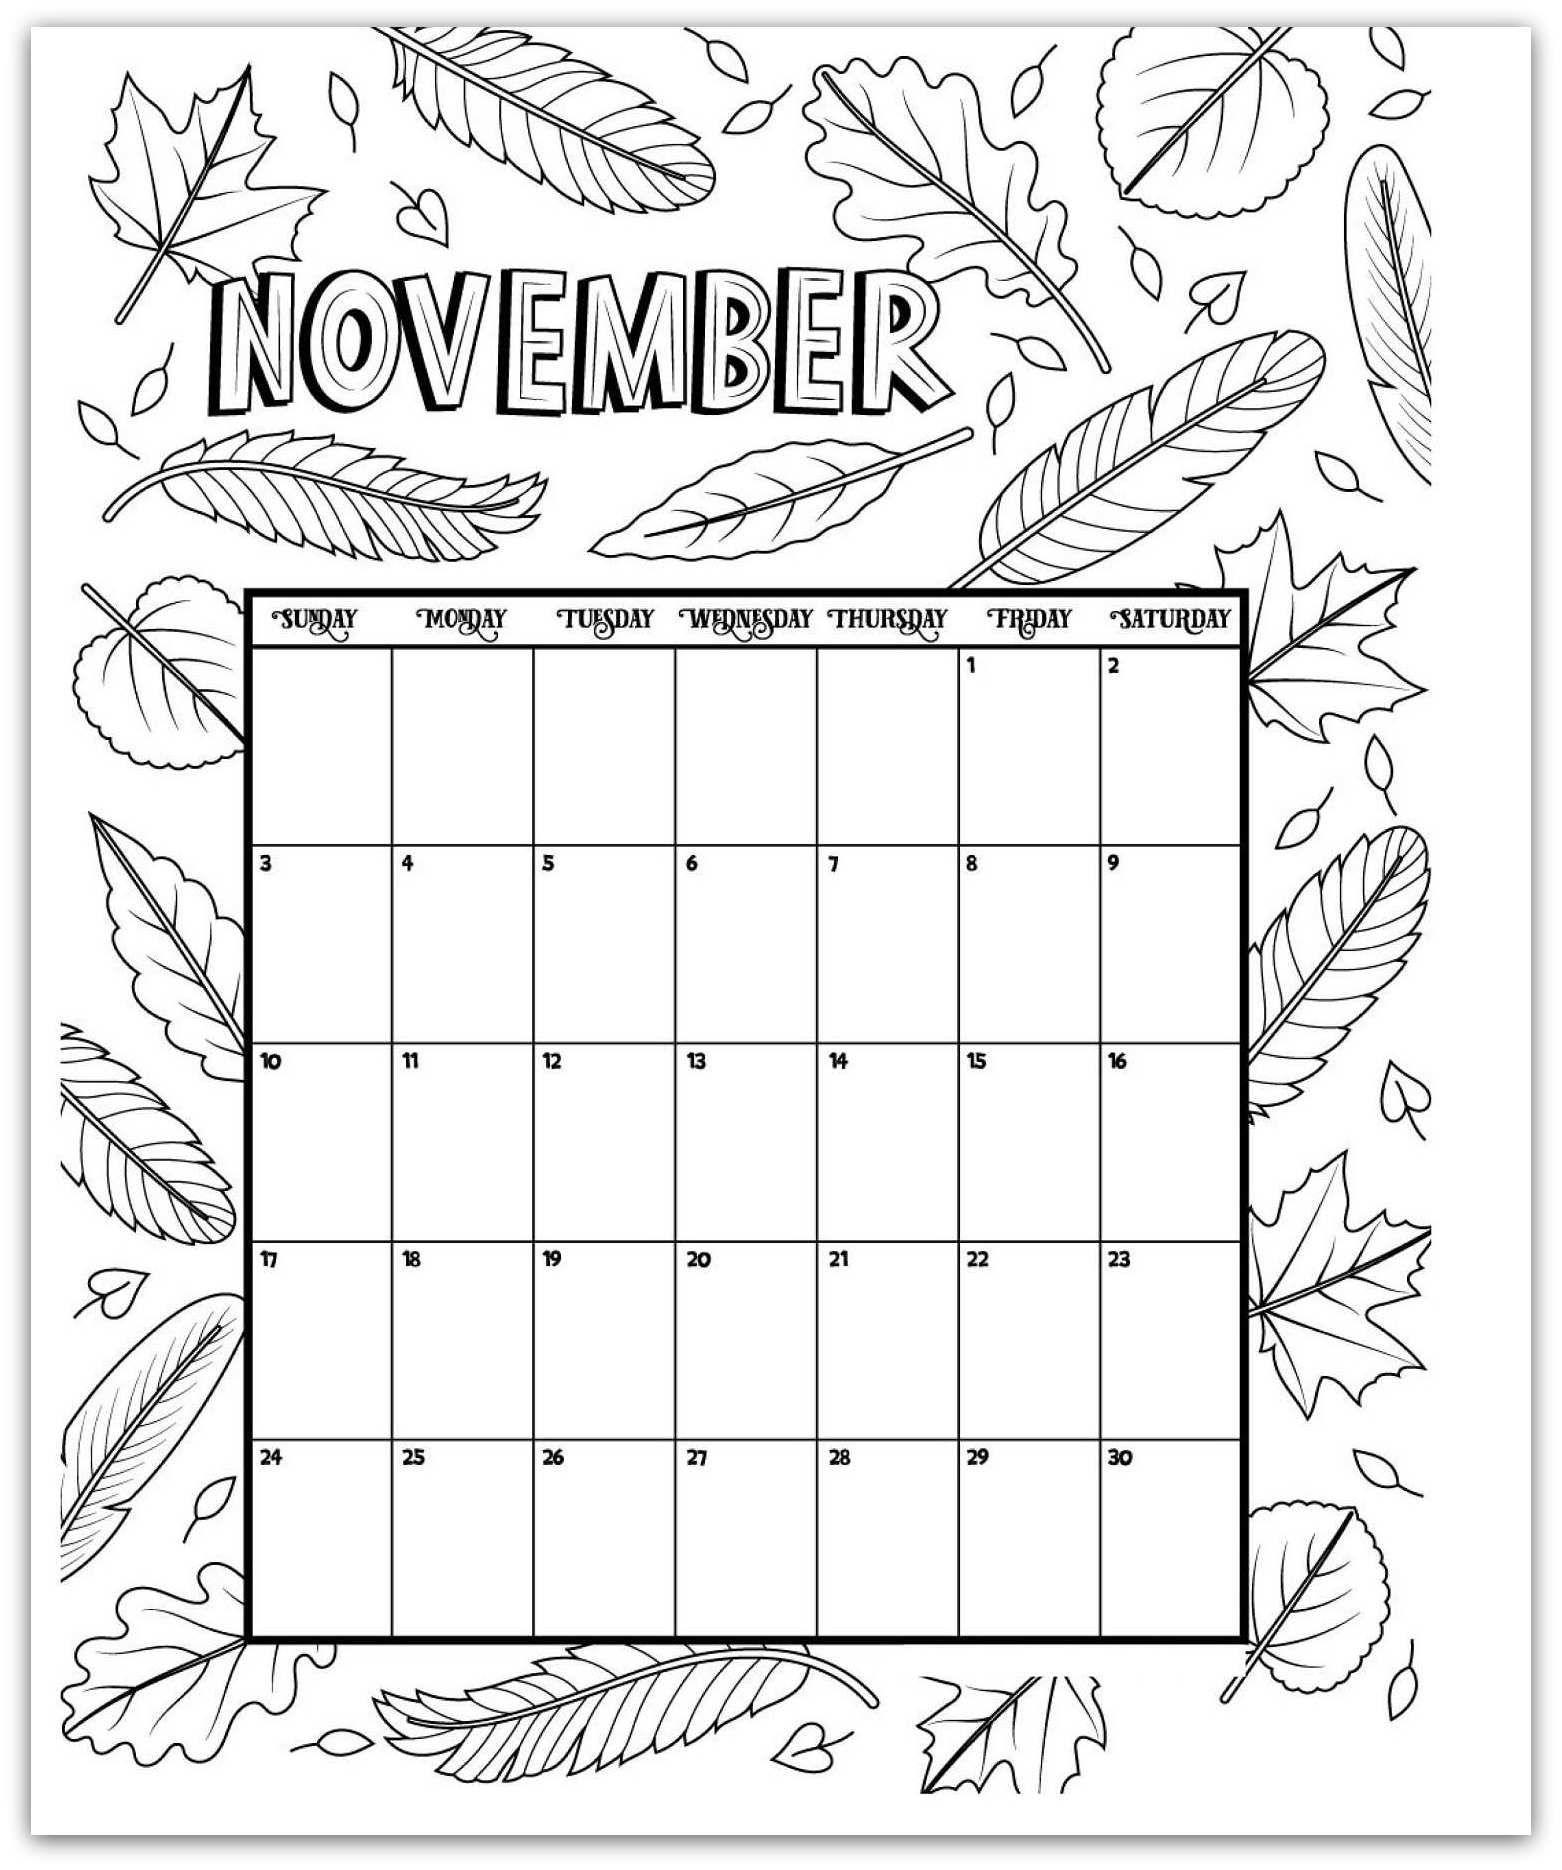 November 2019 Coloring Page Printable Calendar | 2019